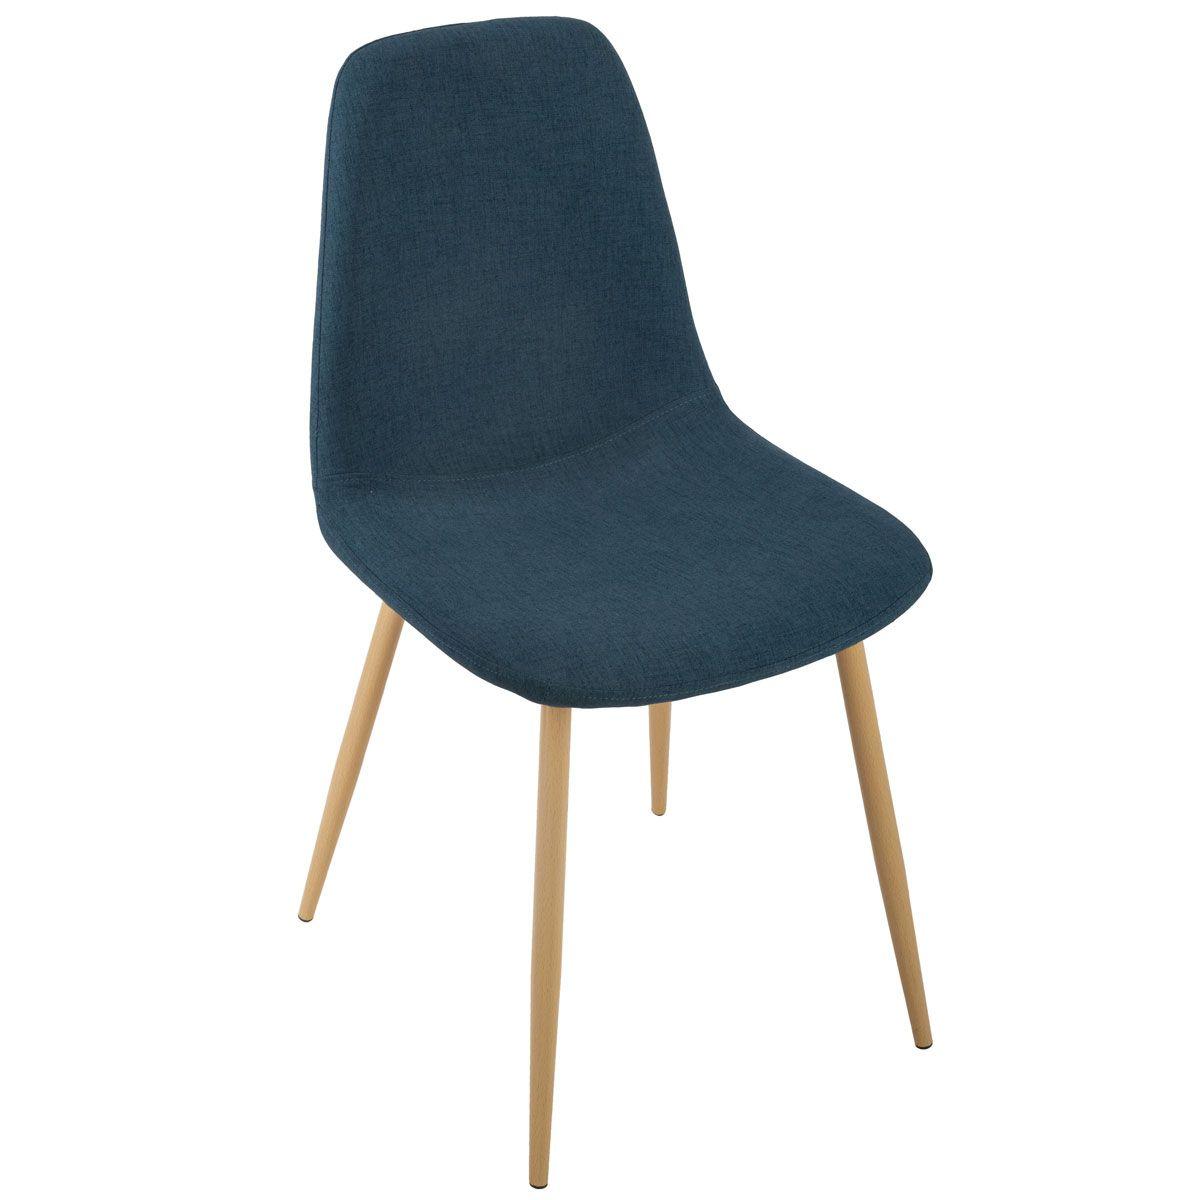 Chaise bleue scandinave Roka